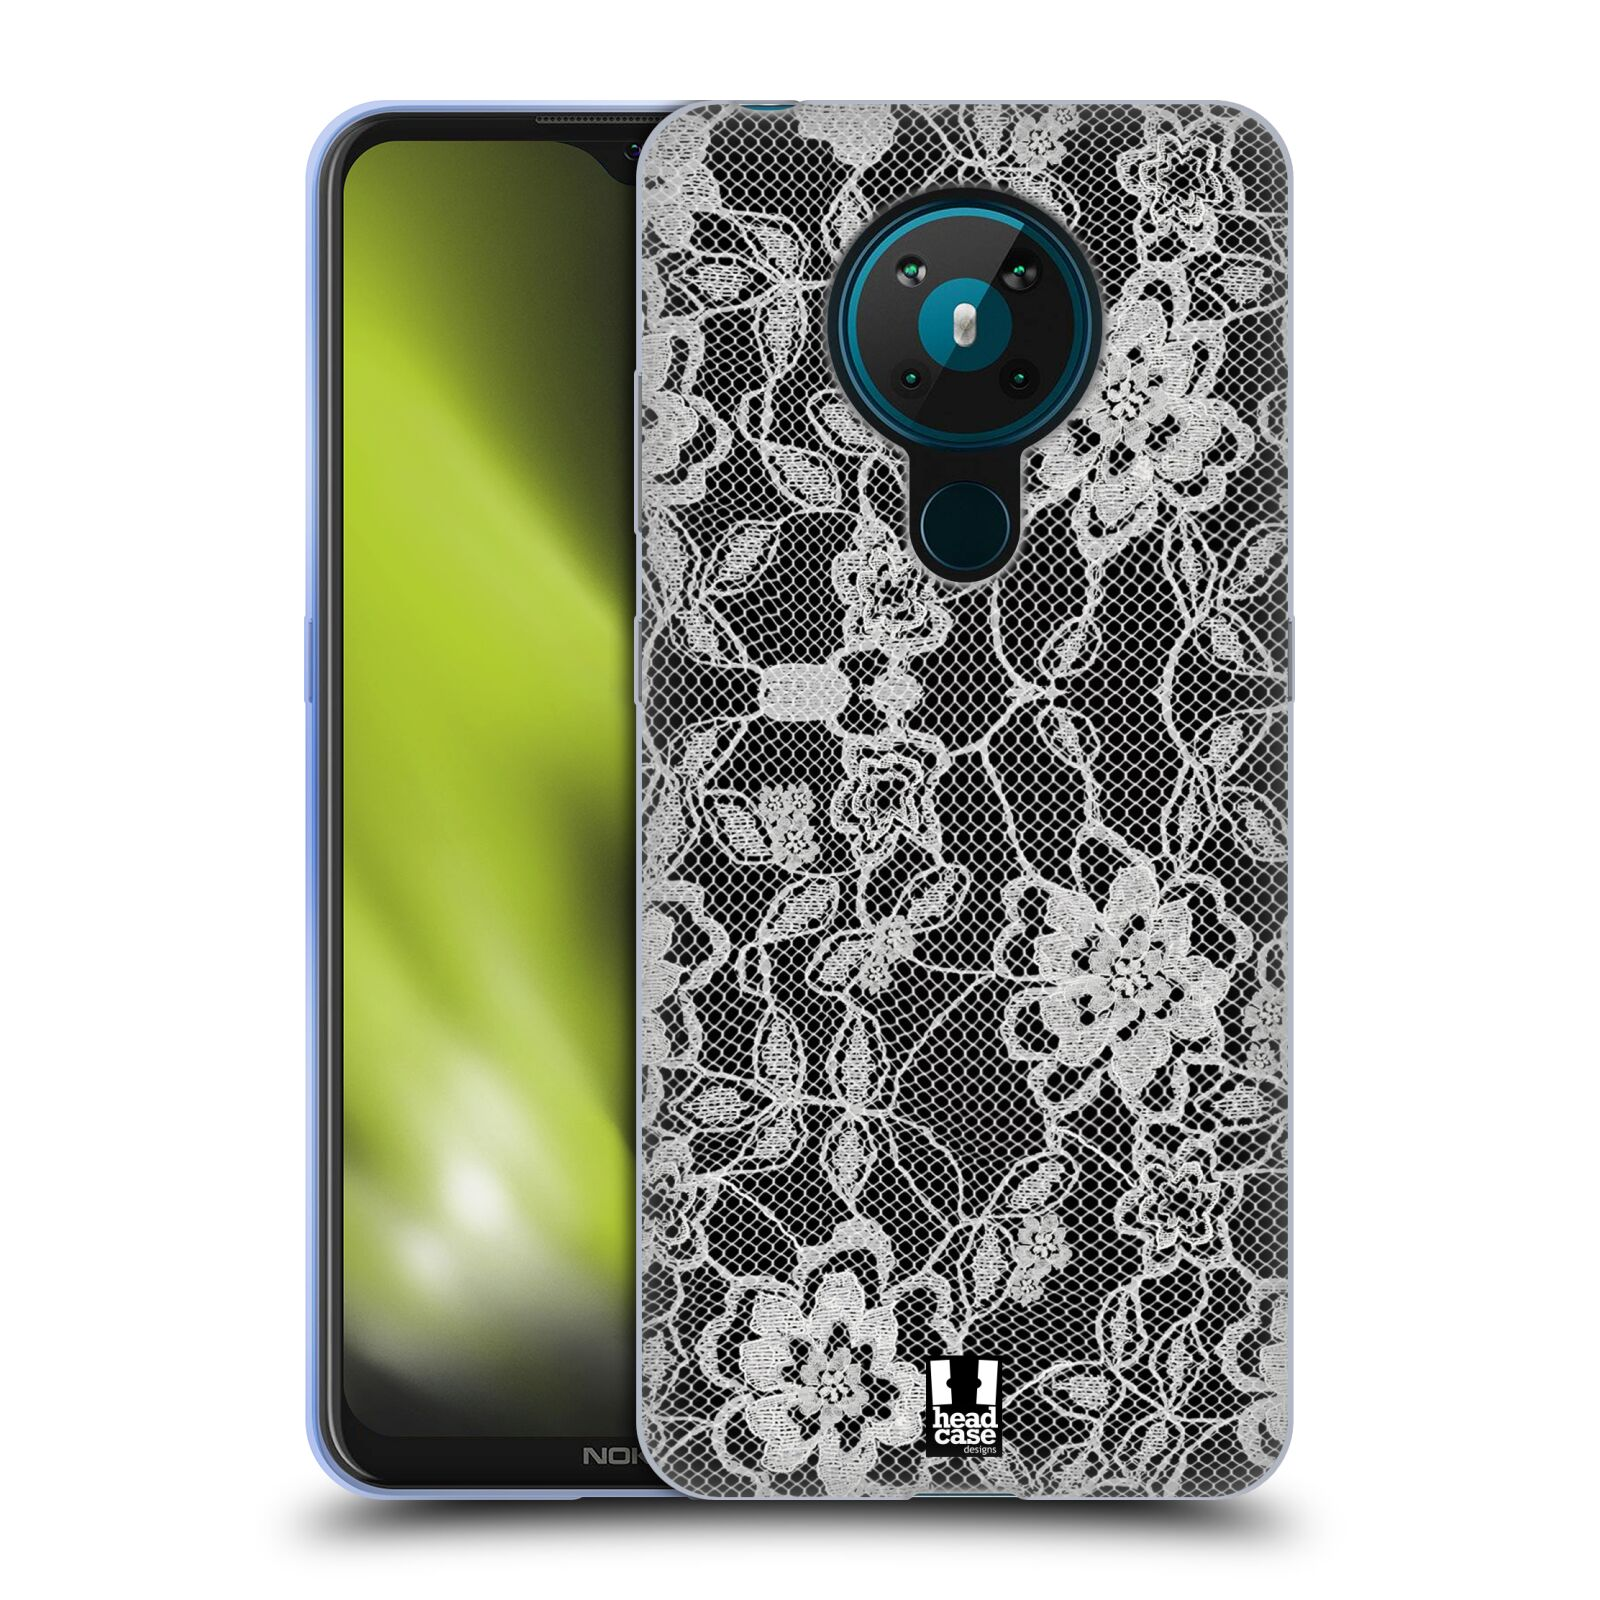 Silikonové pouzdro na mobil Nokia 5.3 - Head Case - FLOWERY KRAJKA